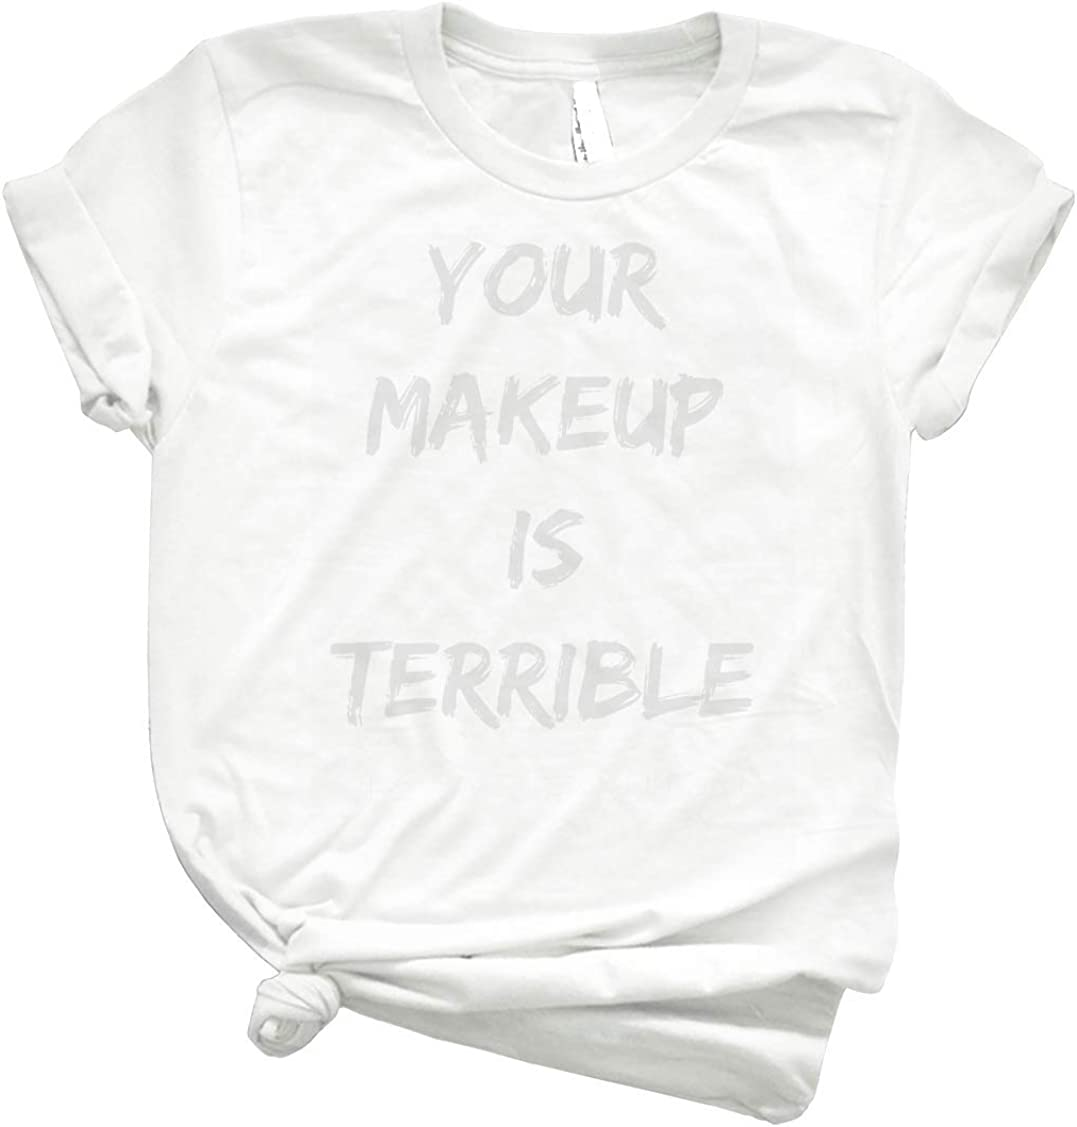 Alaska Thunderfvck 5000 - Your Makeup is Terrible 87 - Gift Idea Shirt for Men Tee for Women Classic Retro